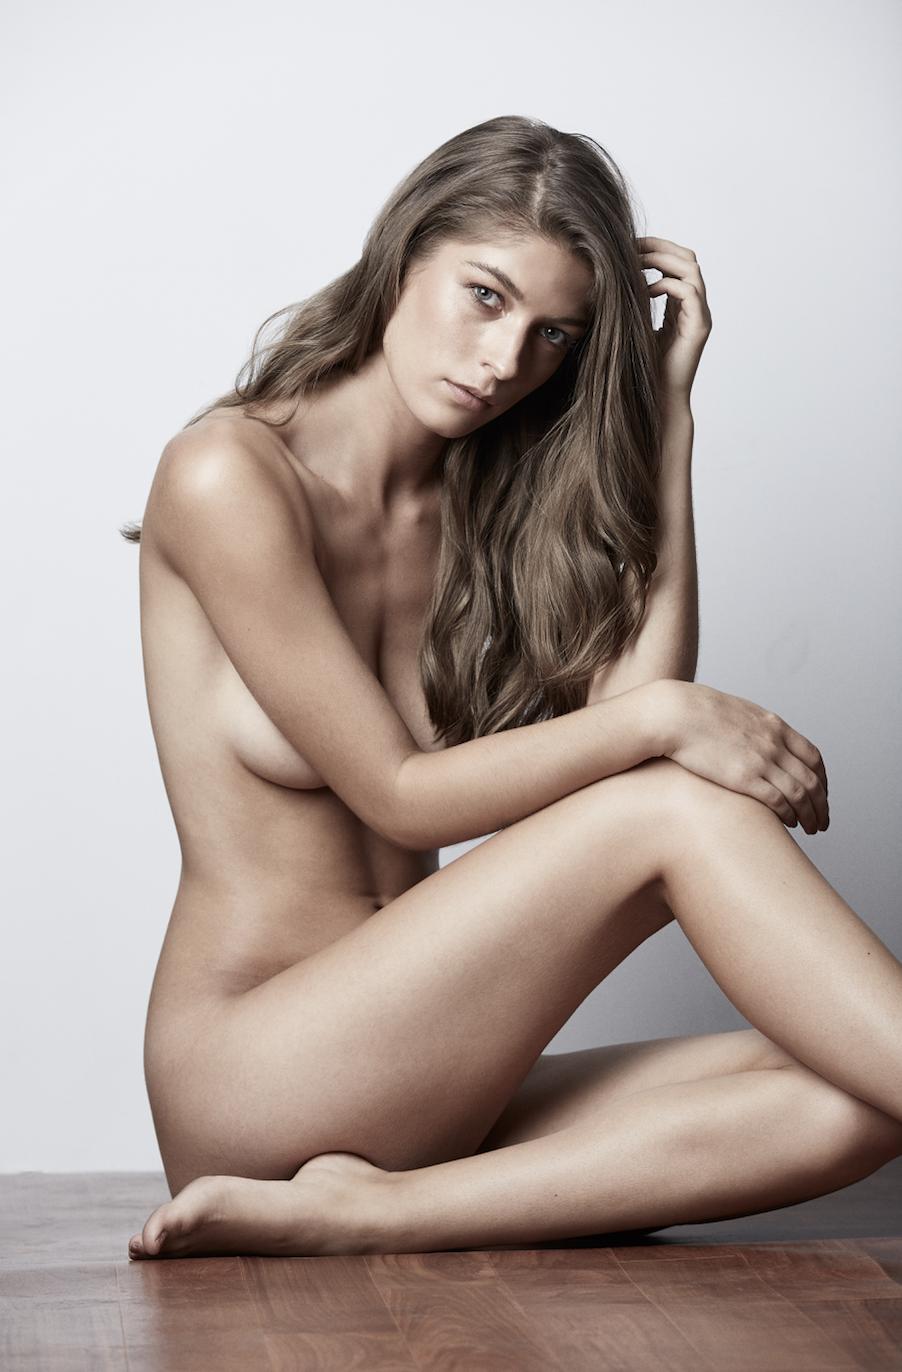 Naked Australian Nude Tasteful Gif